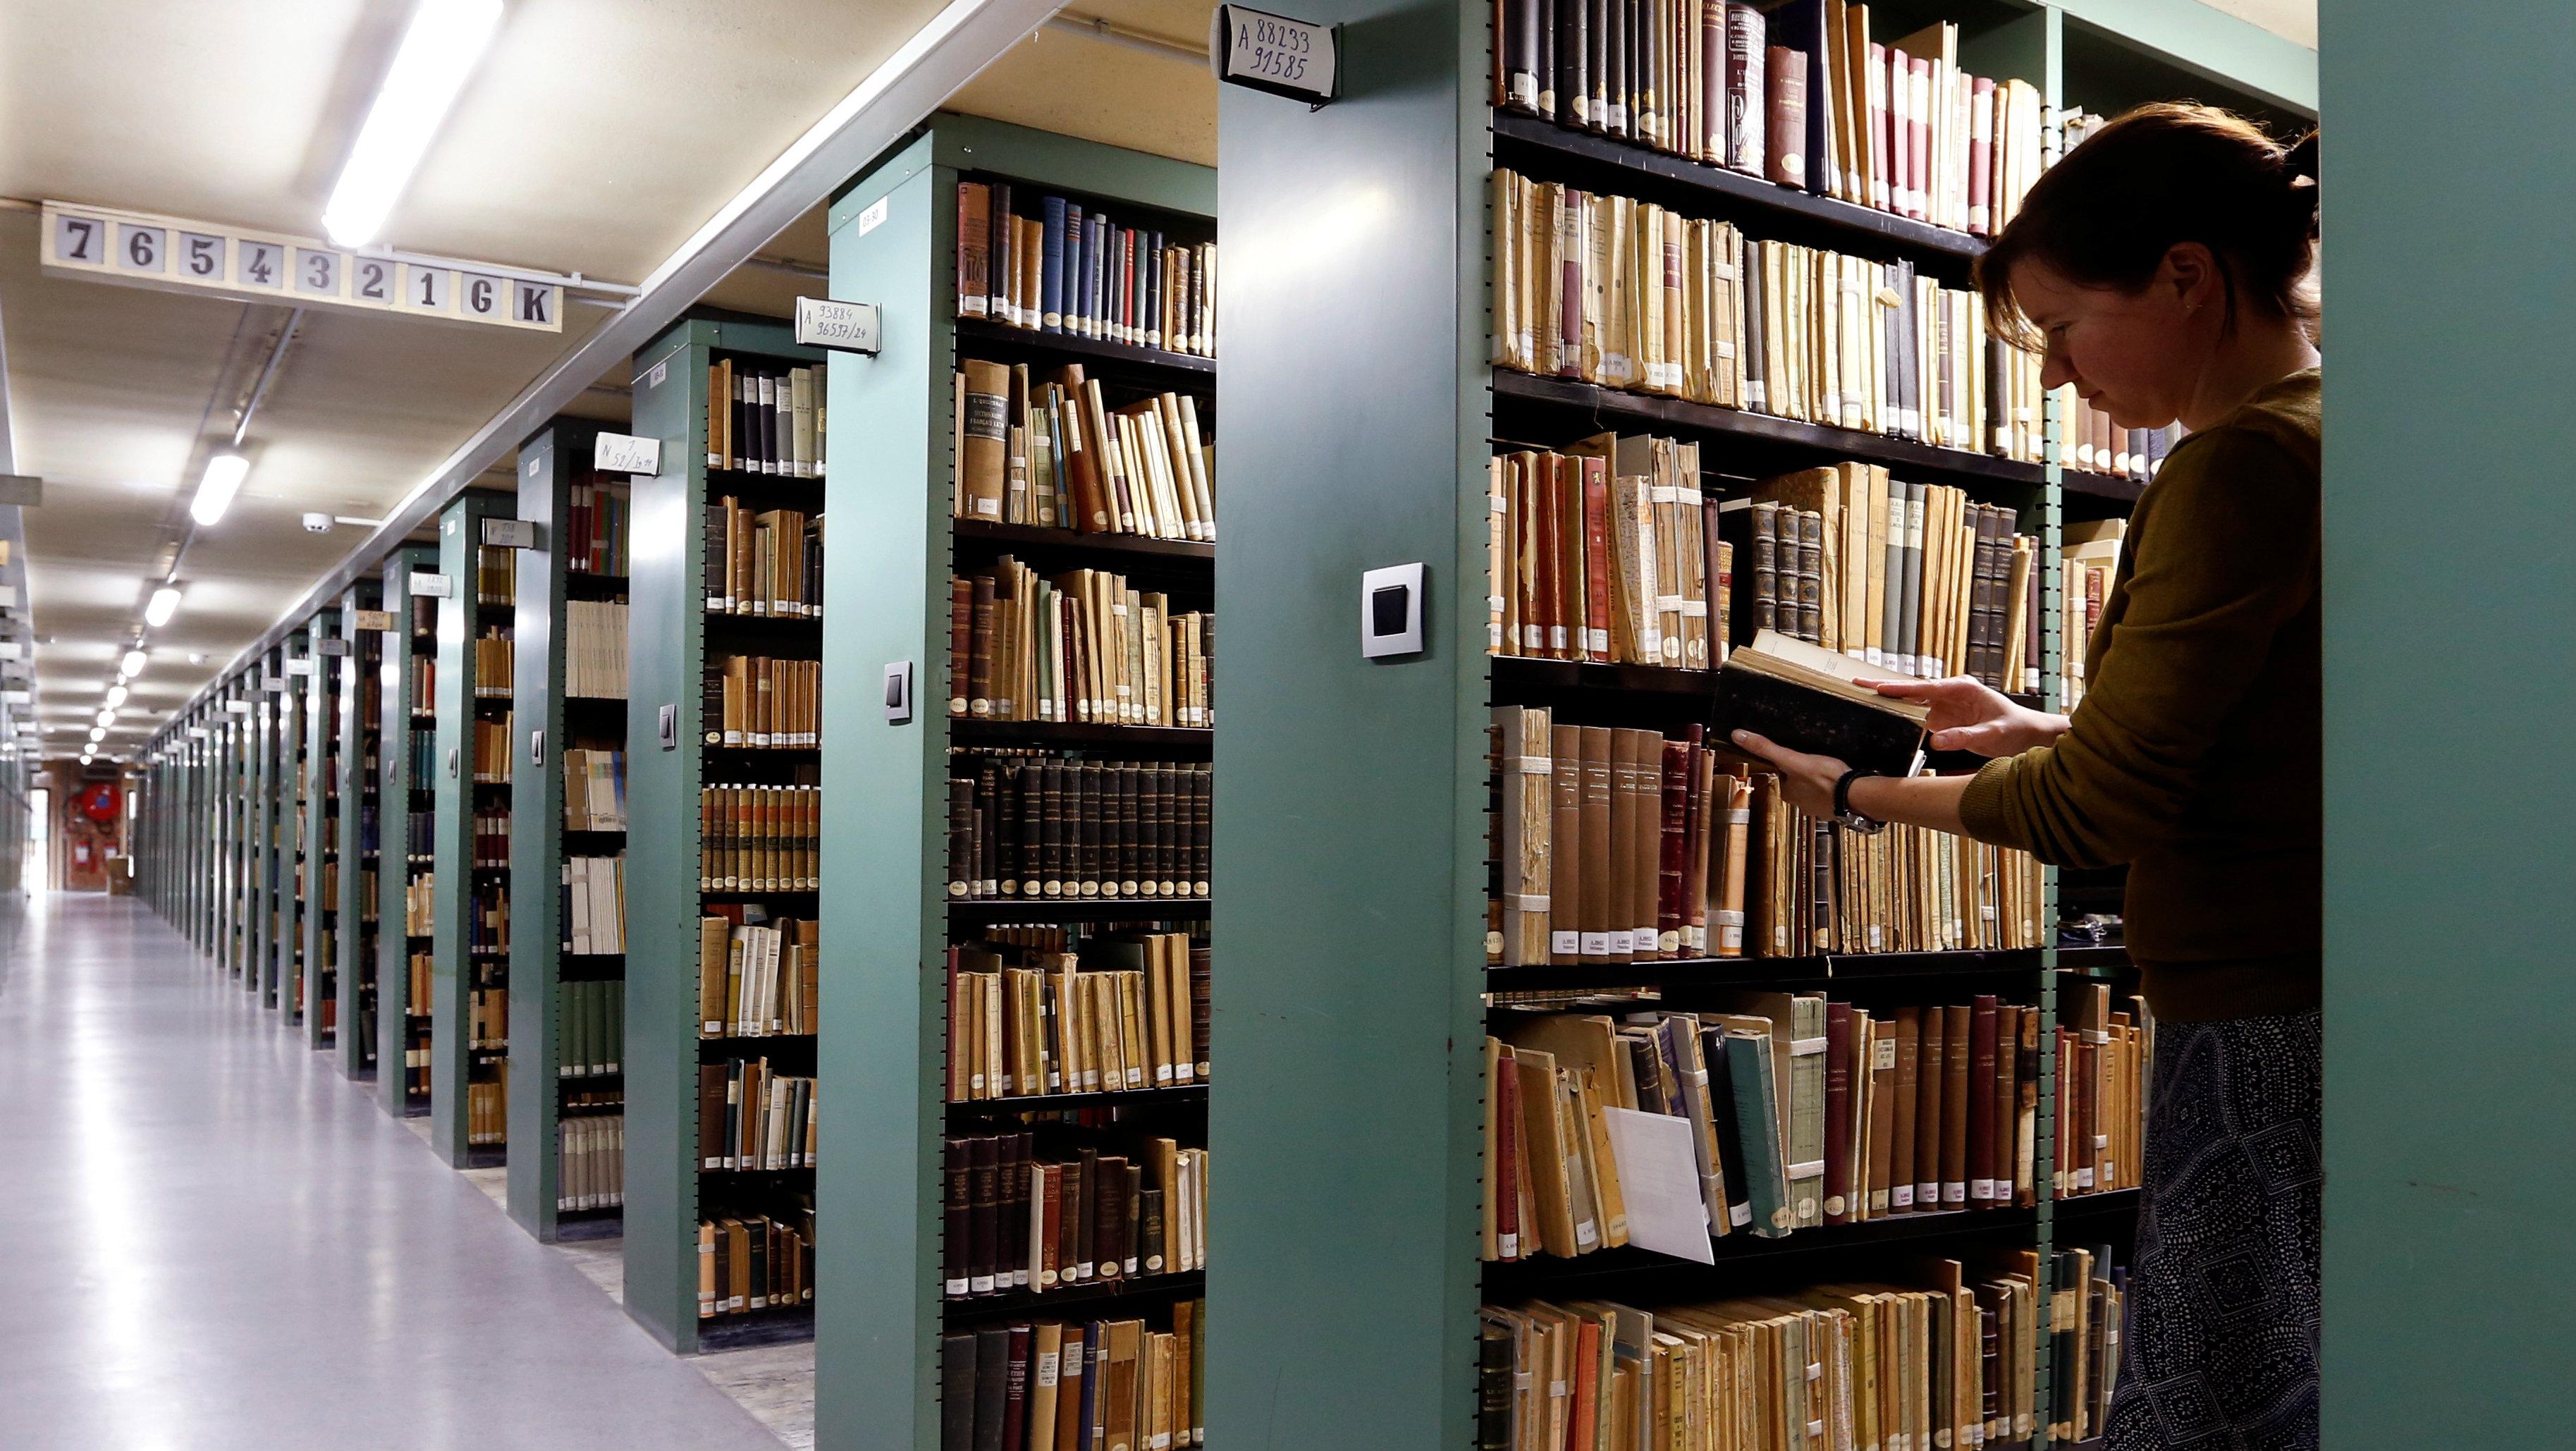 "A woman consults a book in the library of the university KU Leuven ""Katholieke Universiteit Leuven"" in Leuven, Belgium, June 8, 2016."